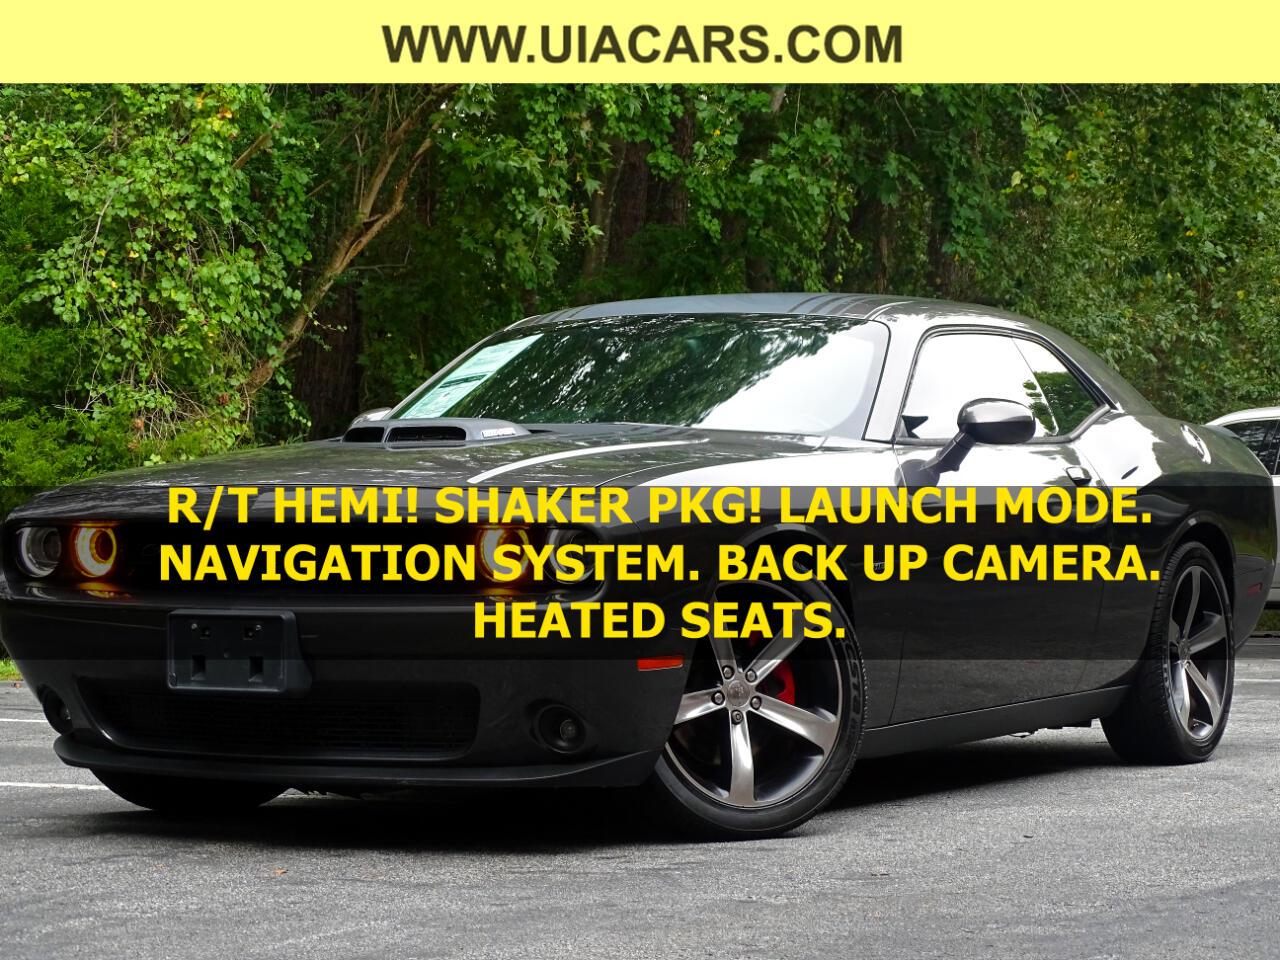 Dodge Challenger 2dr Cpe R/T Plus Shaker 2015